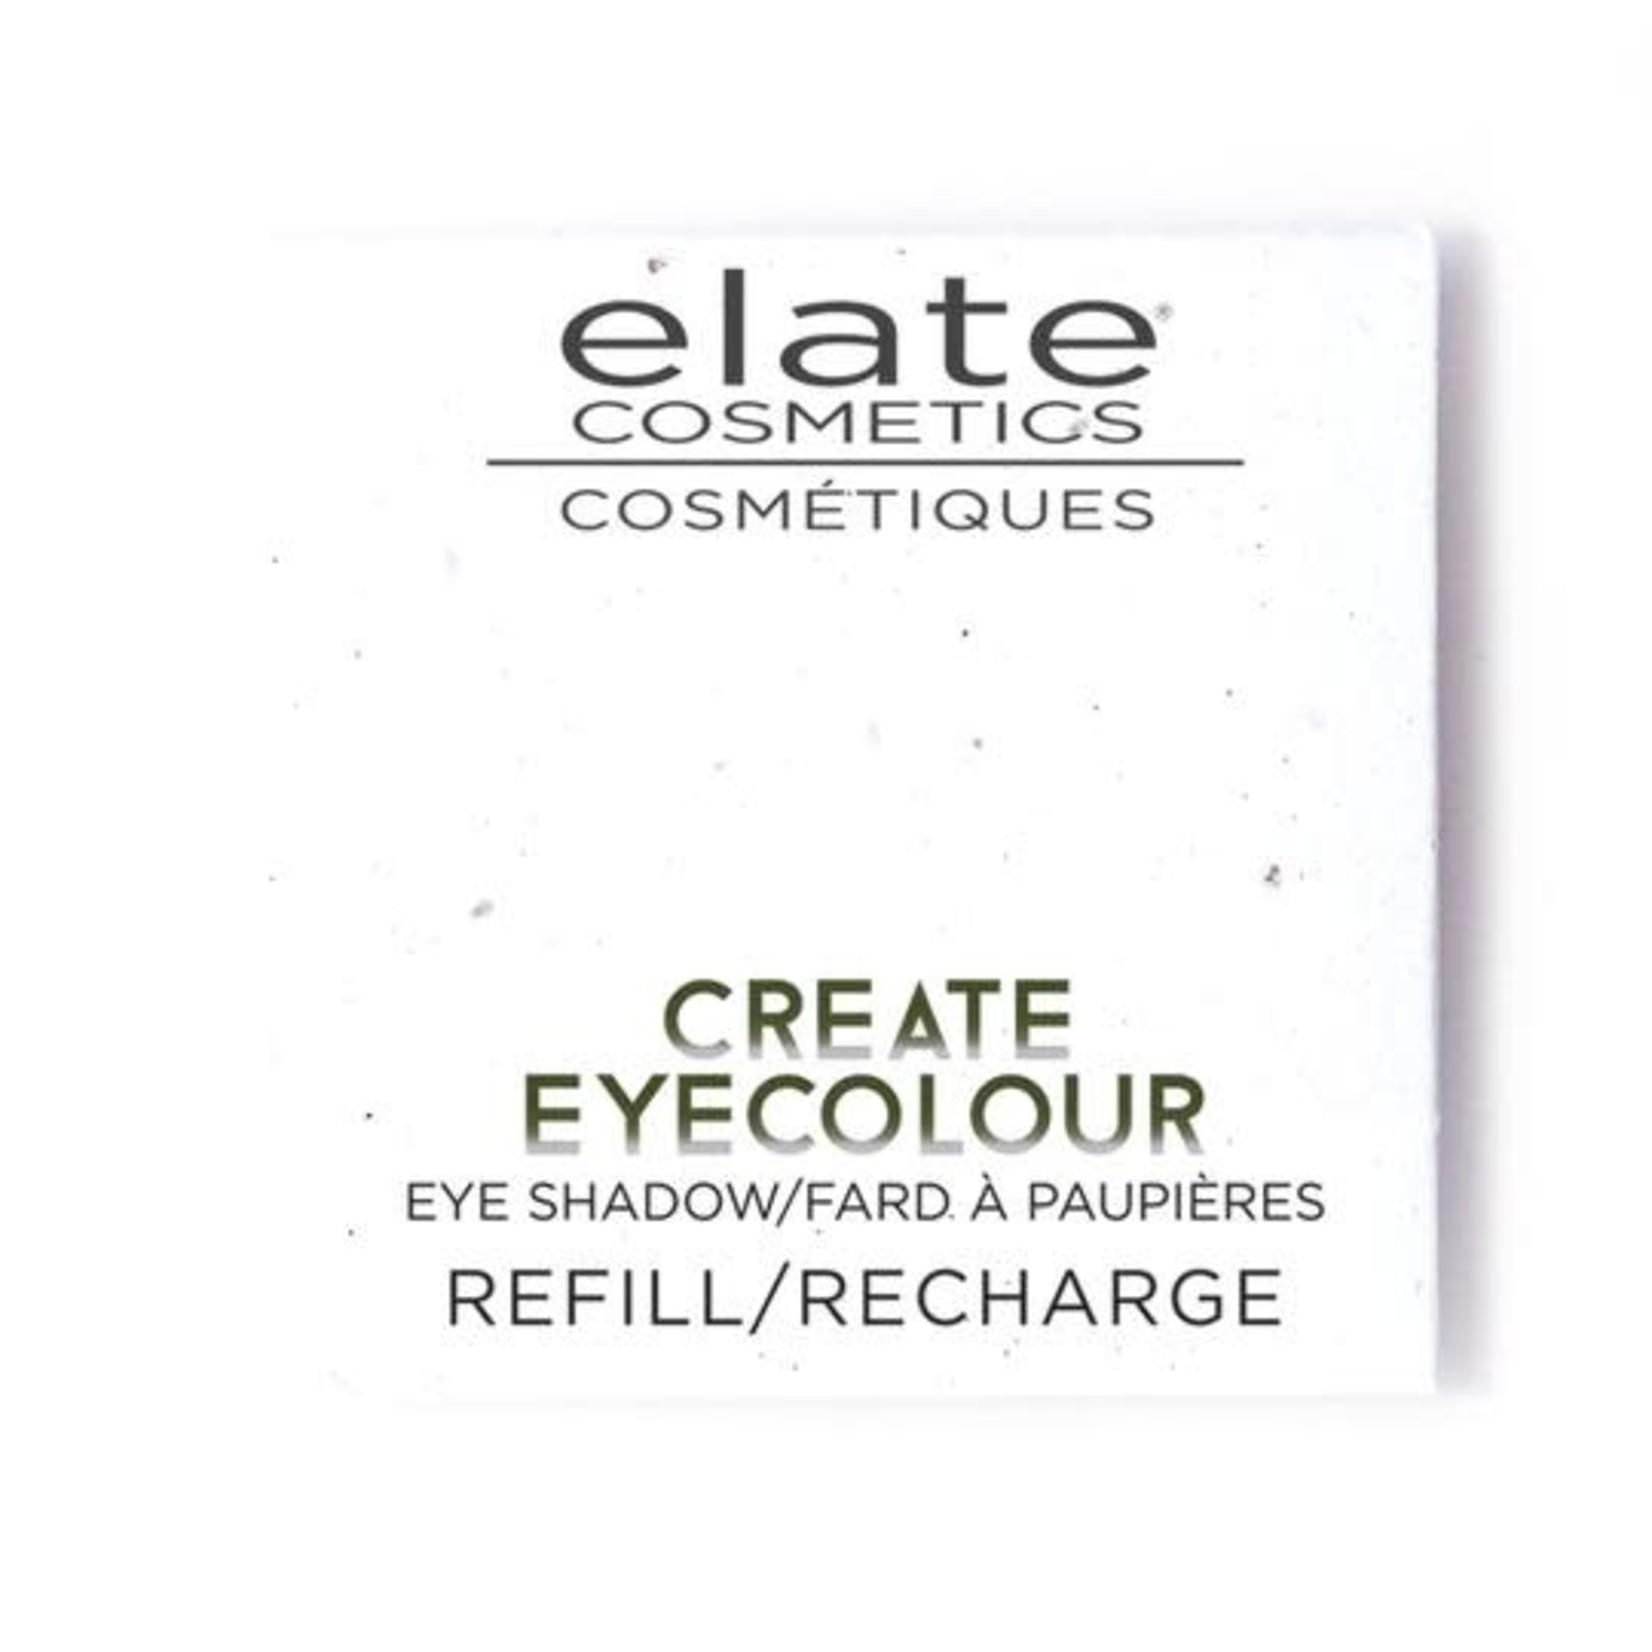 ELATE COSMETICS PRESSED EYECOLOUR - SWEET